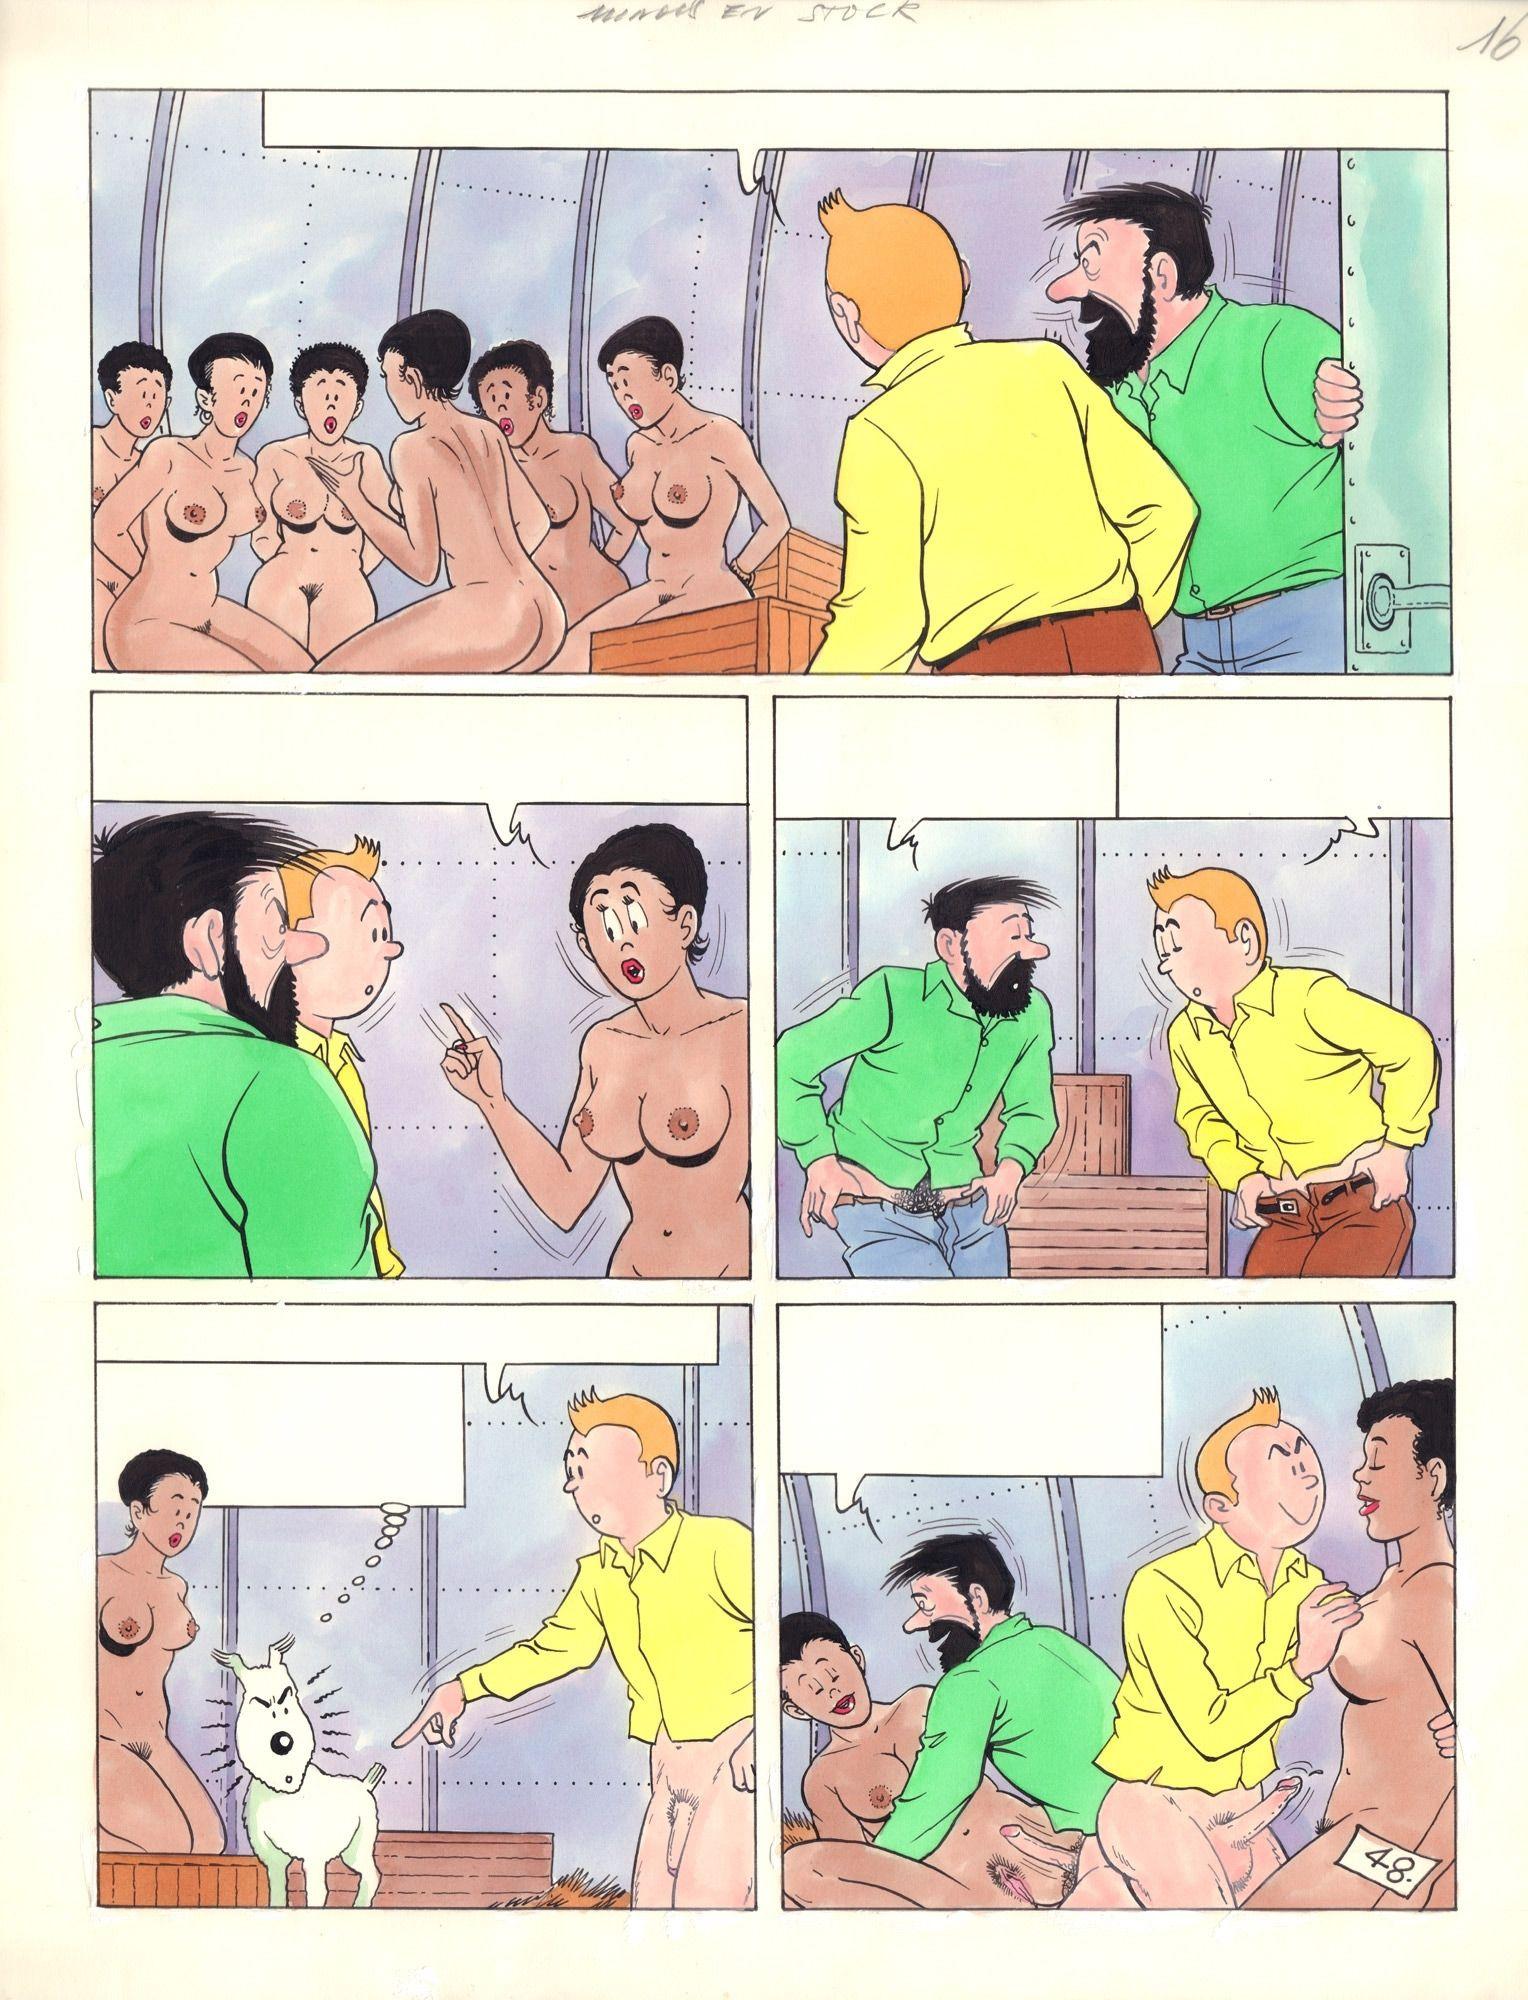 Tintin. Le Mariage, s. 48